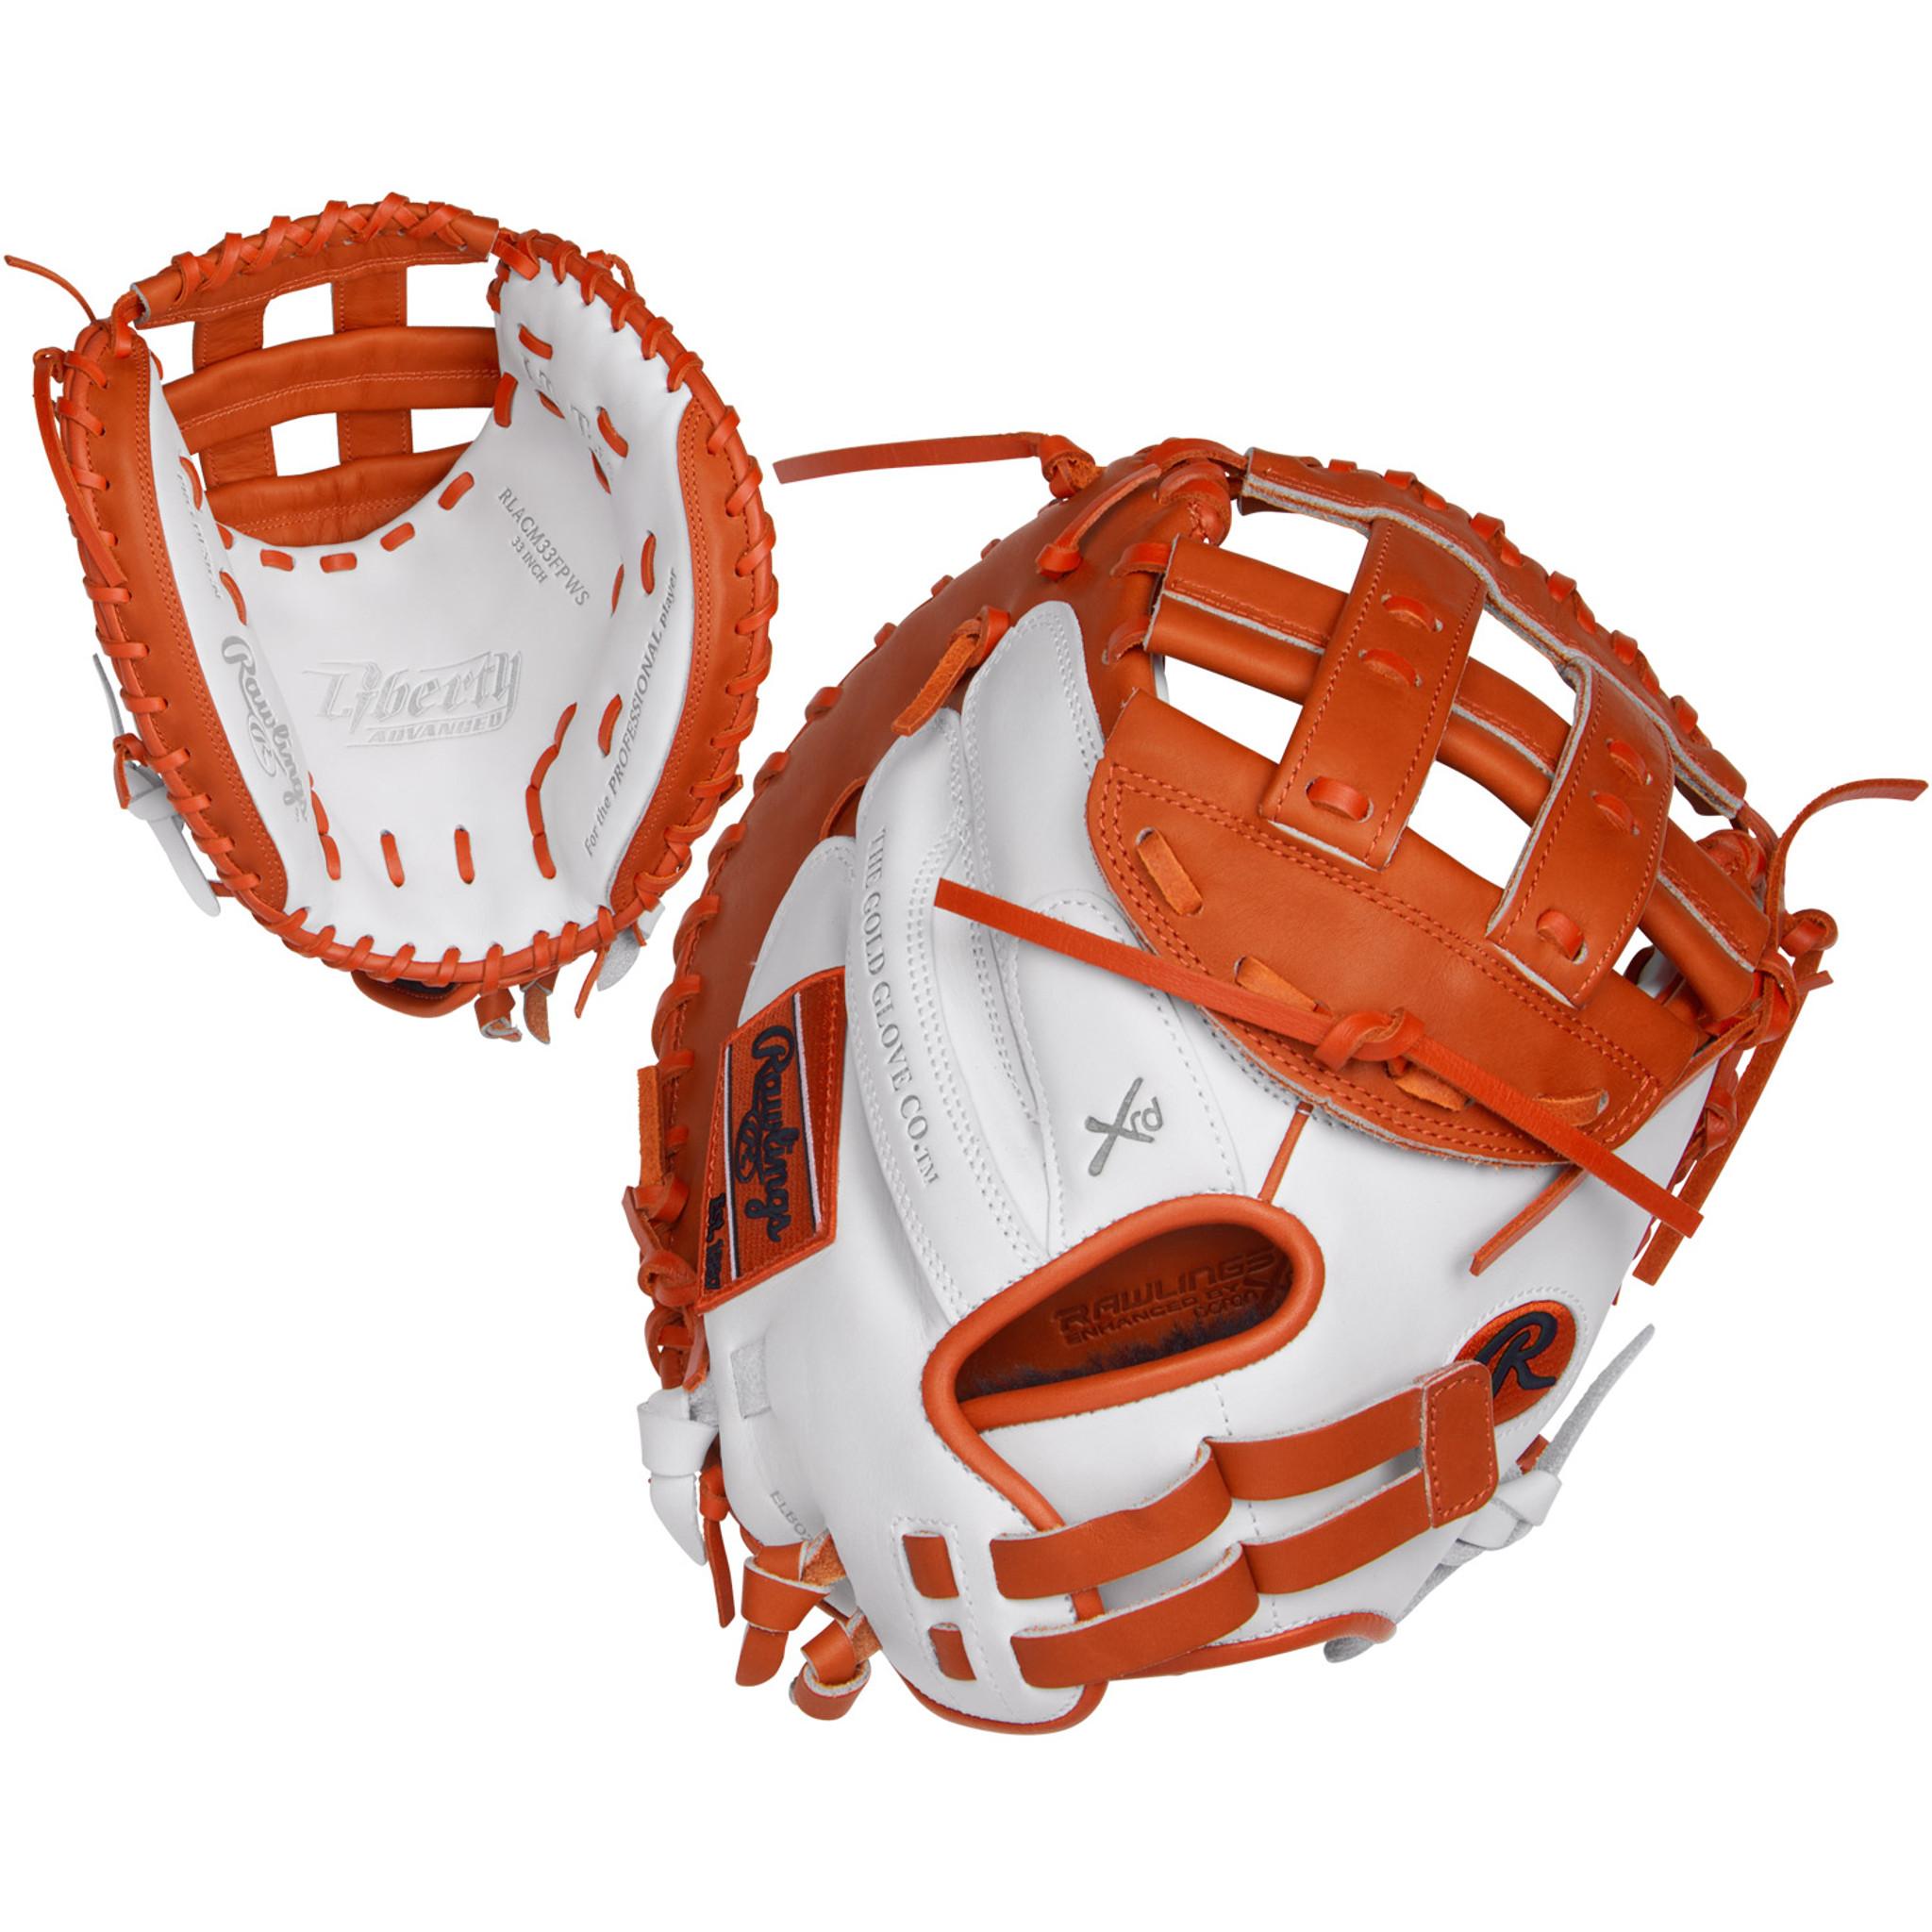 Rawlings Liberty Advanced 33 Inch RLACM33FPDG Fastpitch Softball Catchers Mitt